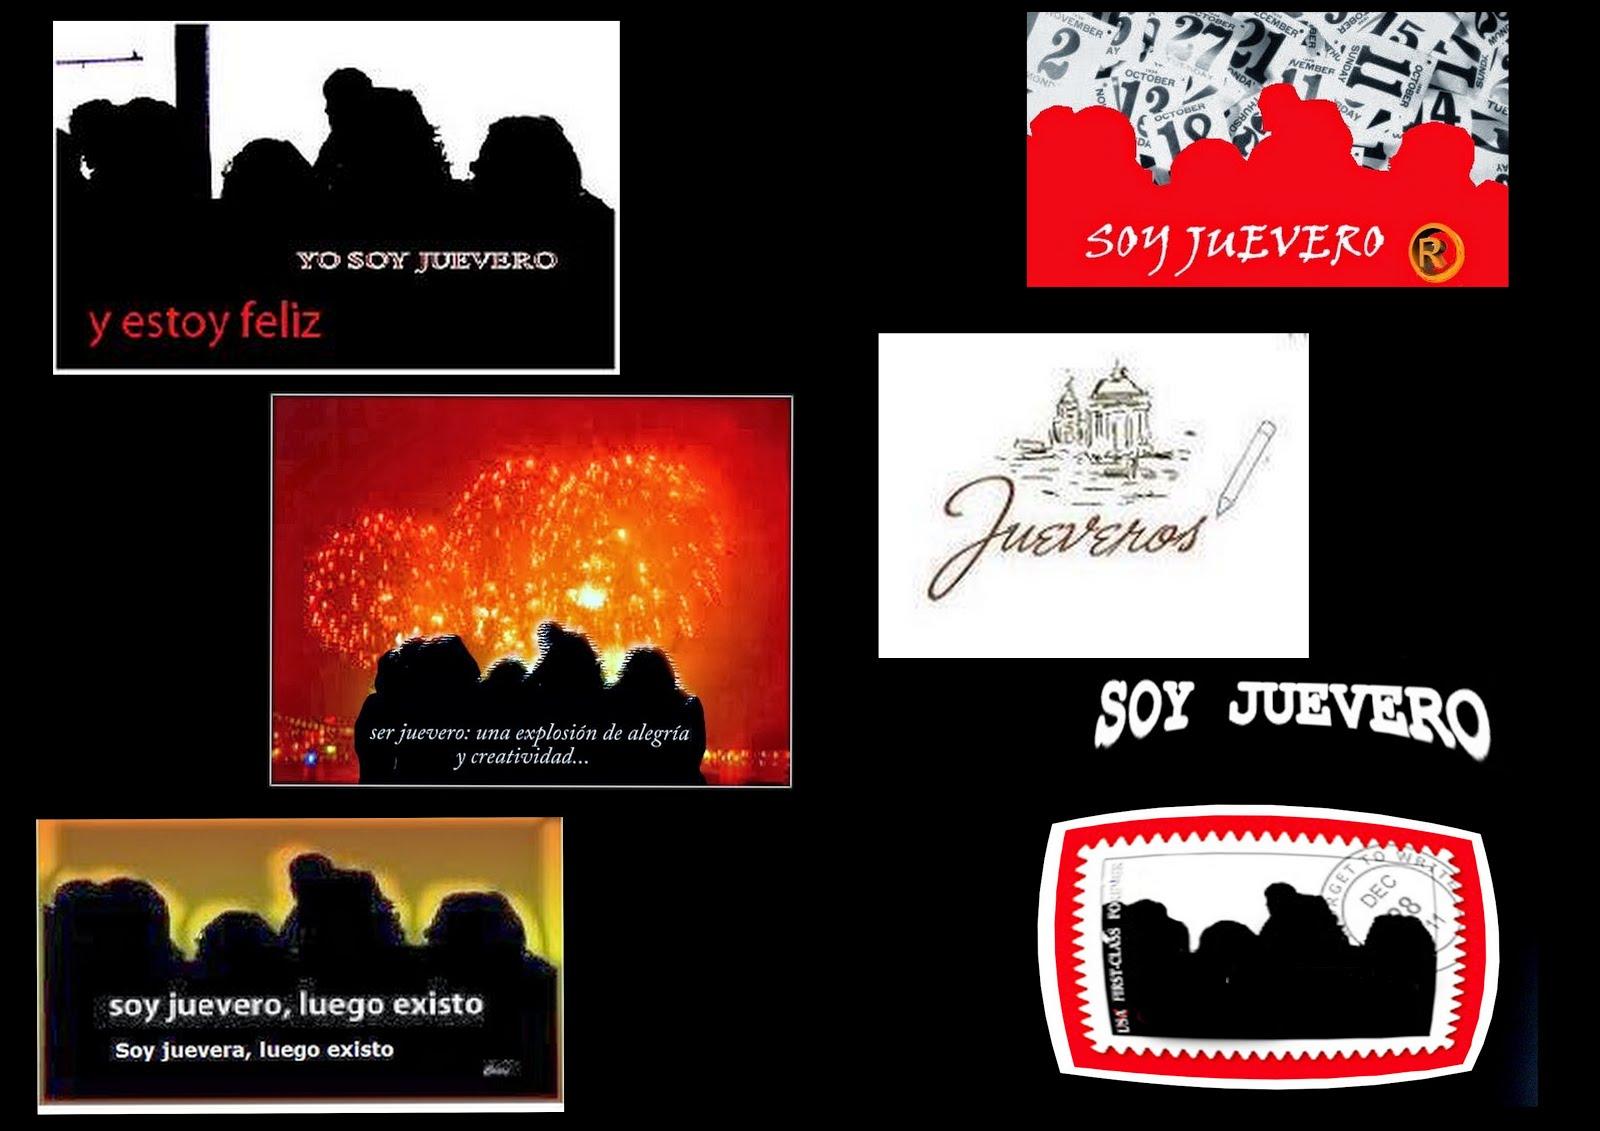 SOY JUEVERO